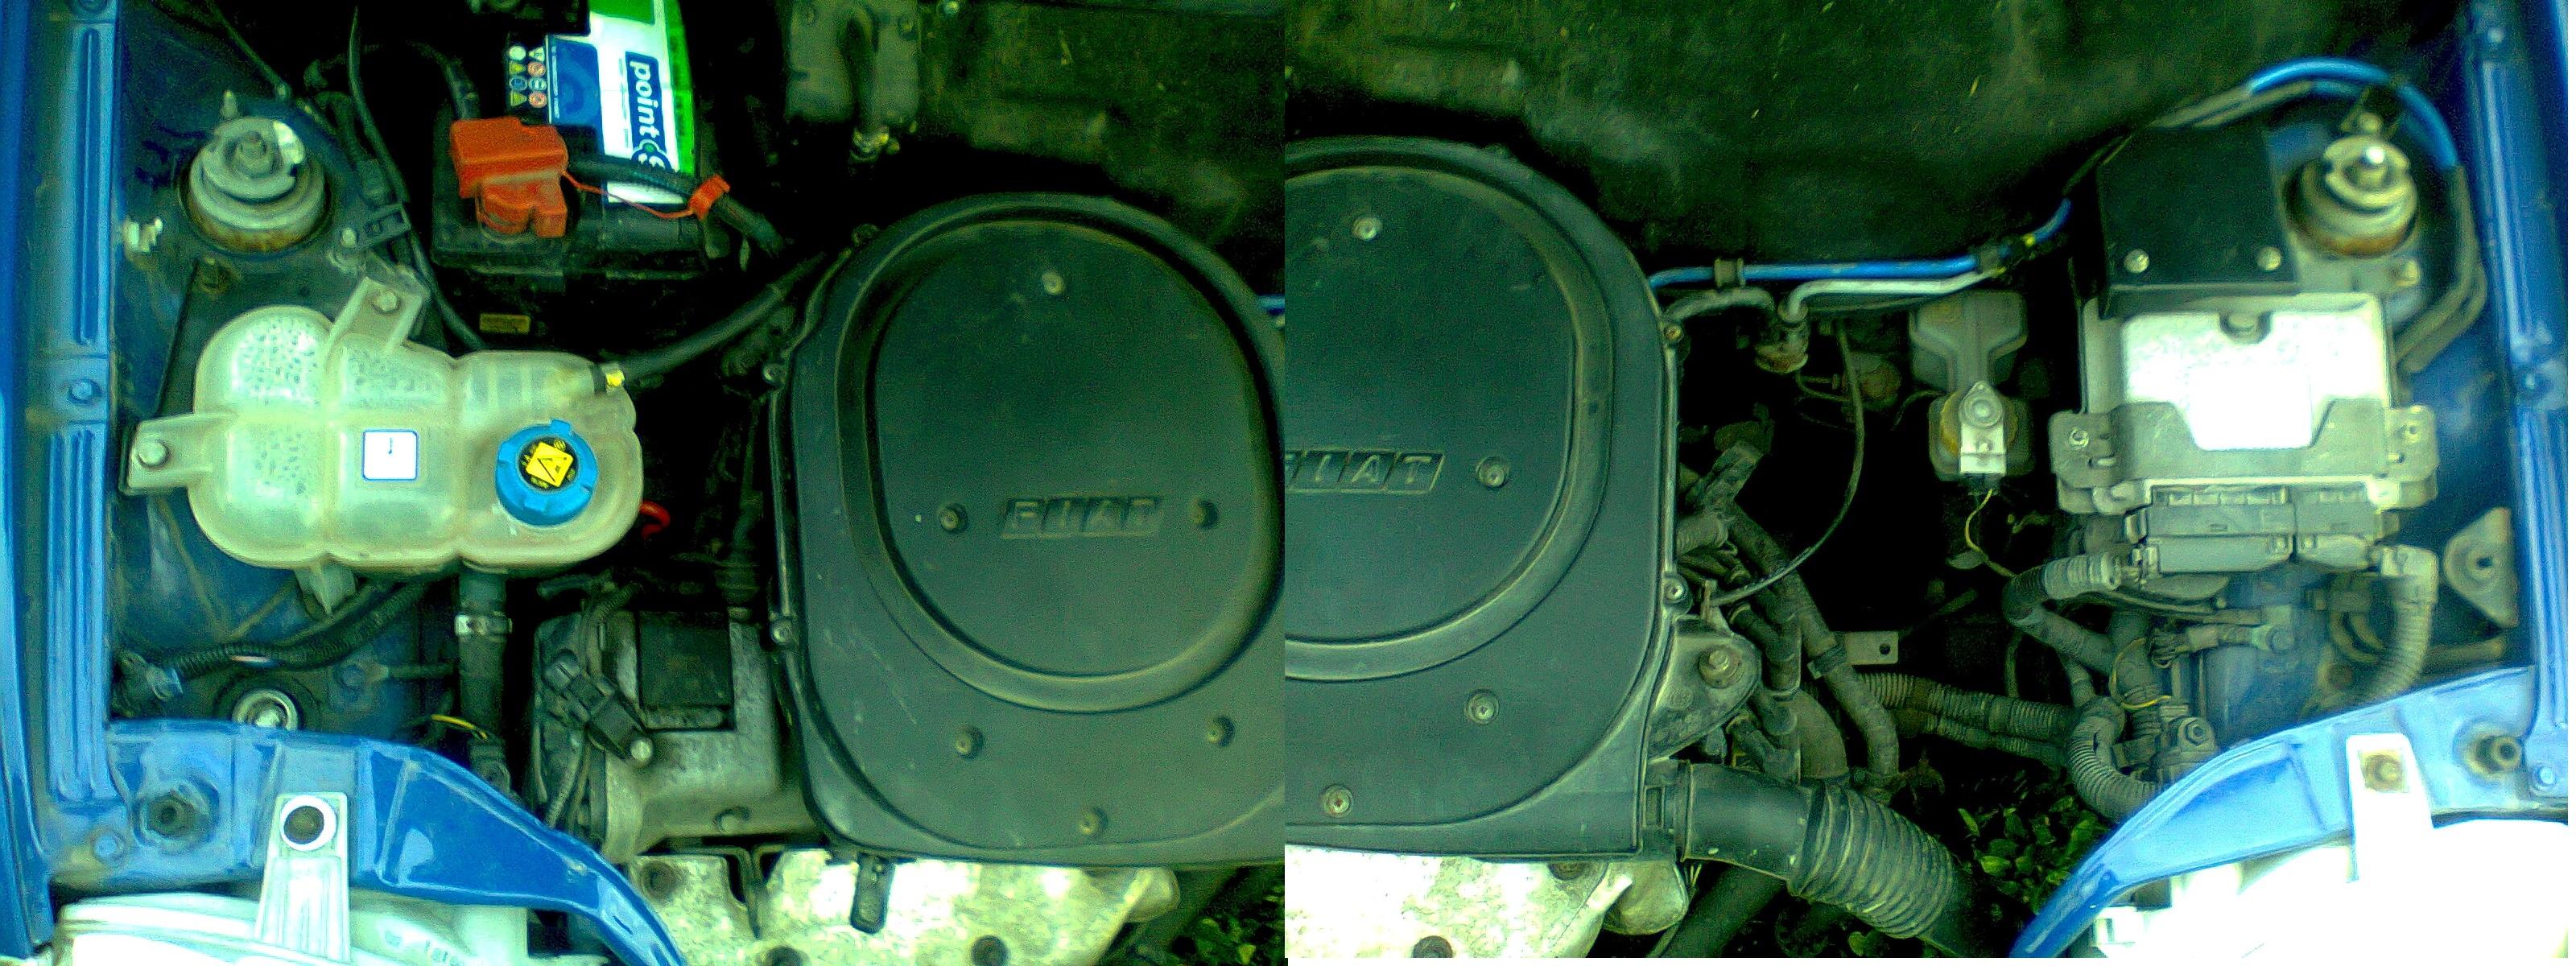 seicento 1.1 MPI - Czujnik temperatury silnika